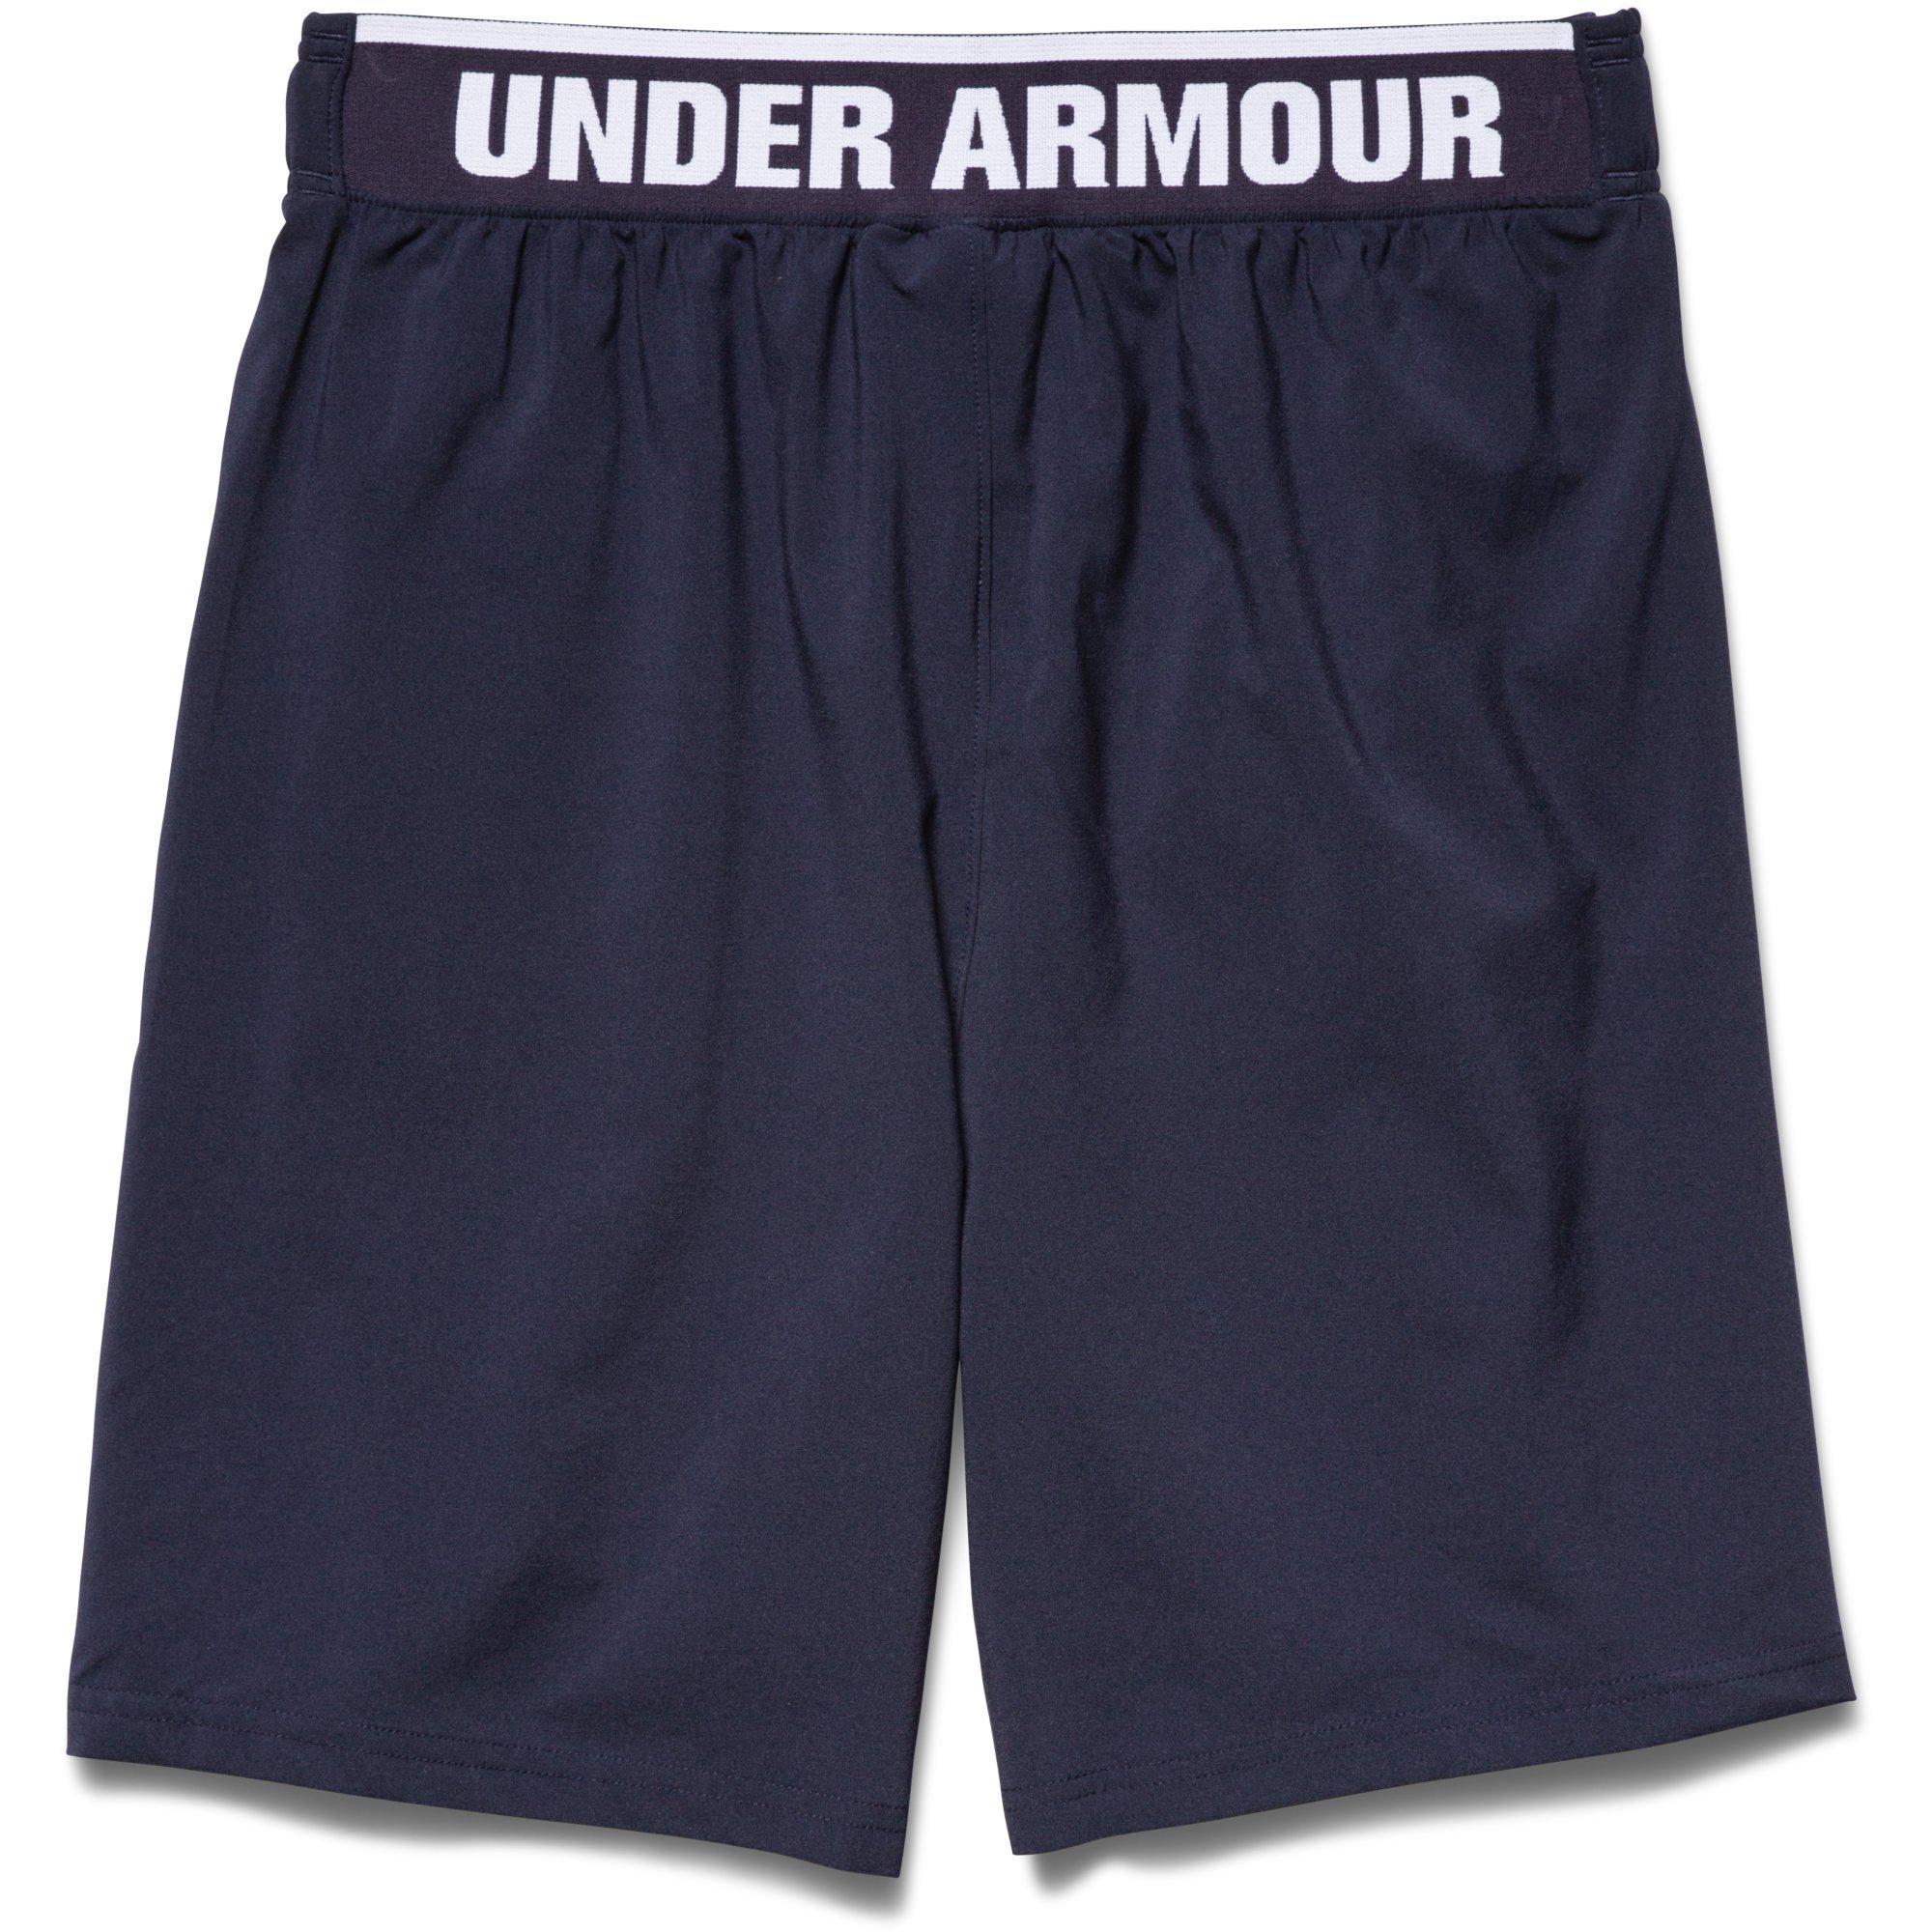 under armour mens mirage 8 inch shorts midnight navy. Black Bedroom Furniture Sets. Home Design Ideas